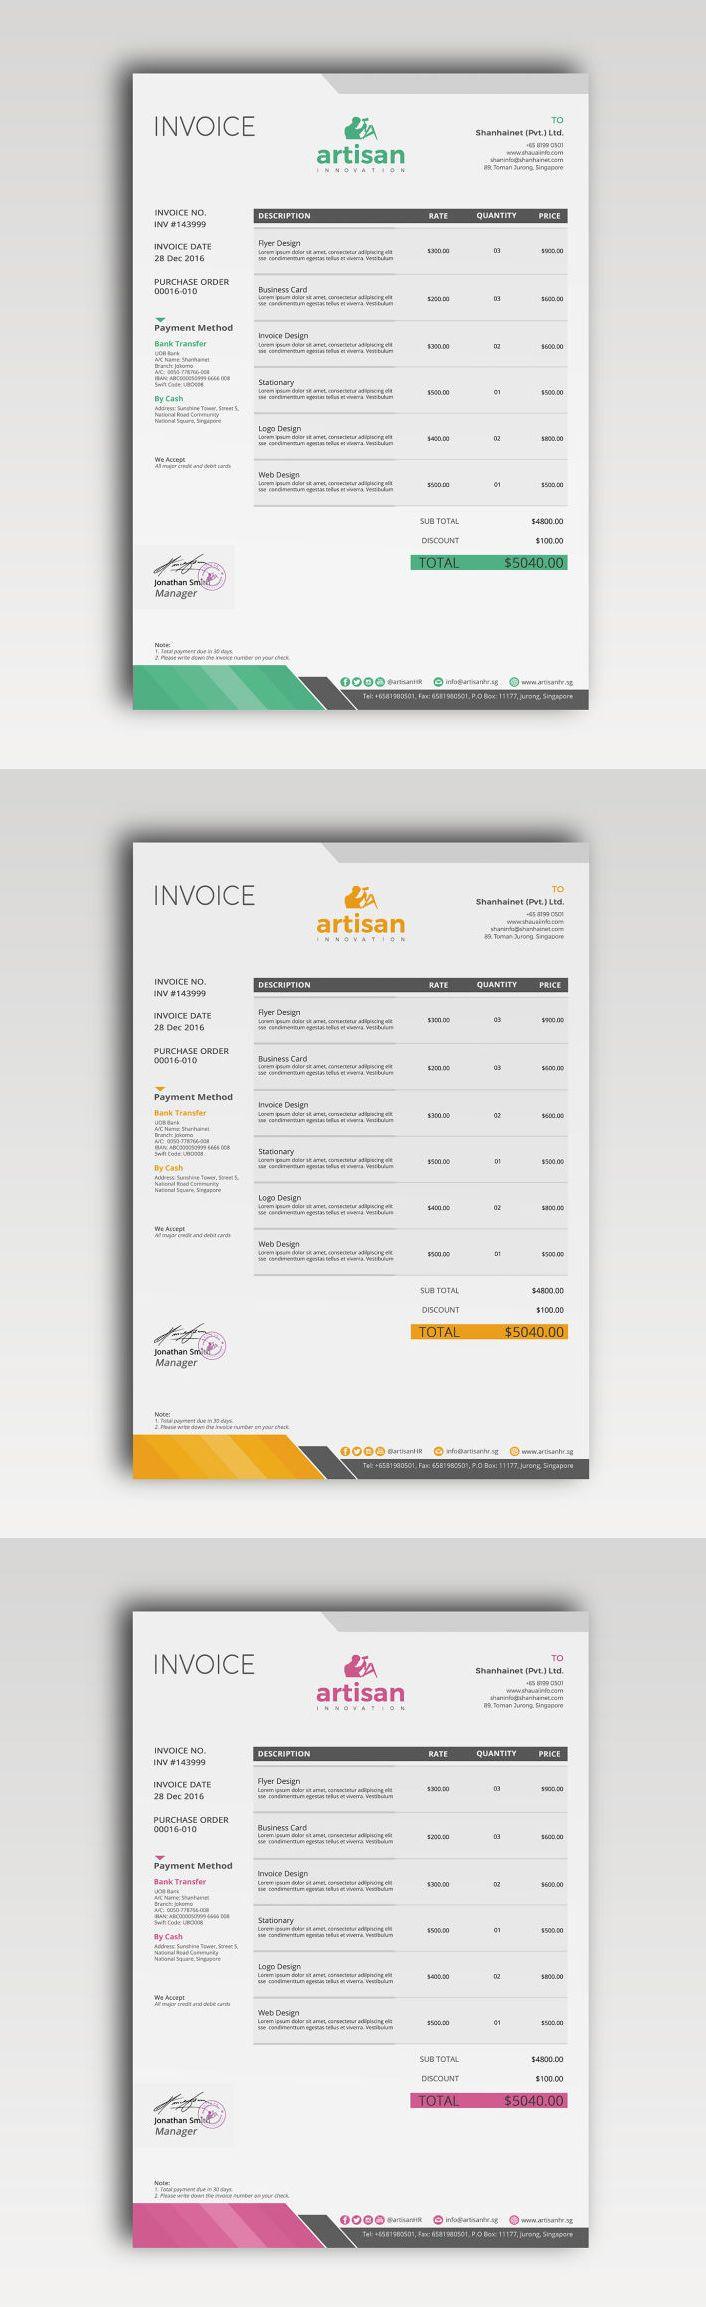 Invoice Design Psd Funfpandroidco - Invoice template psd